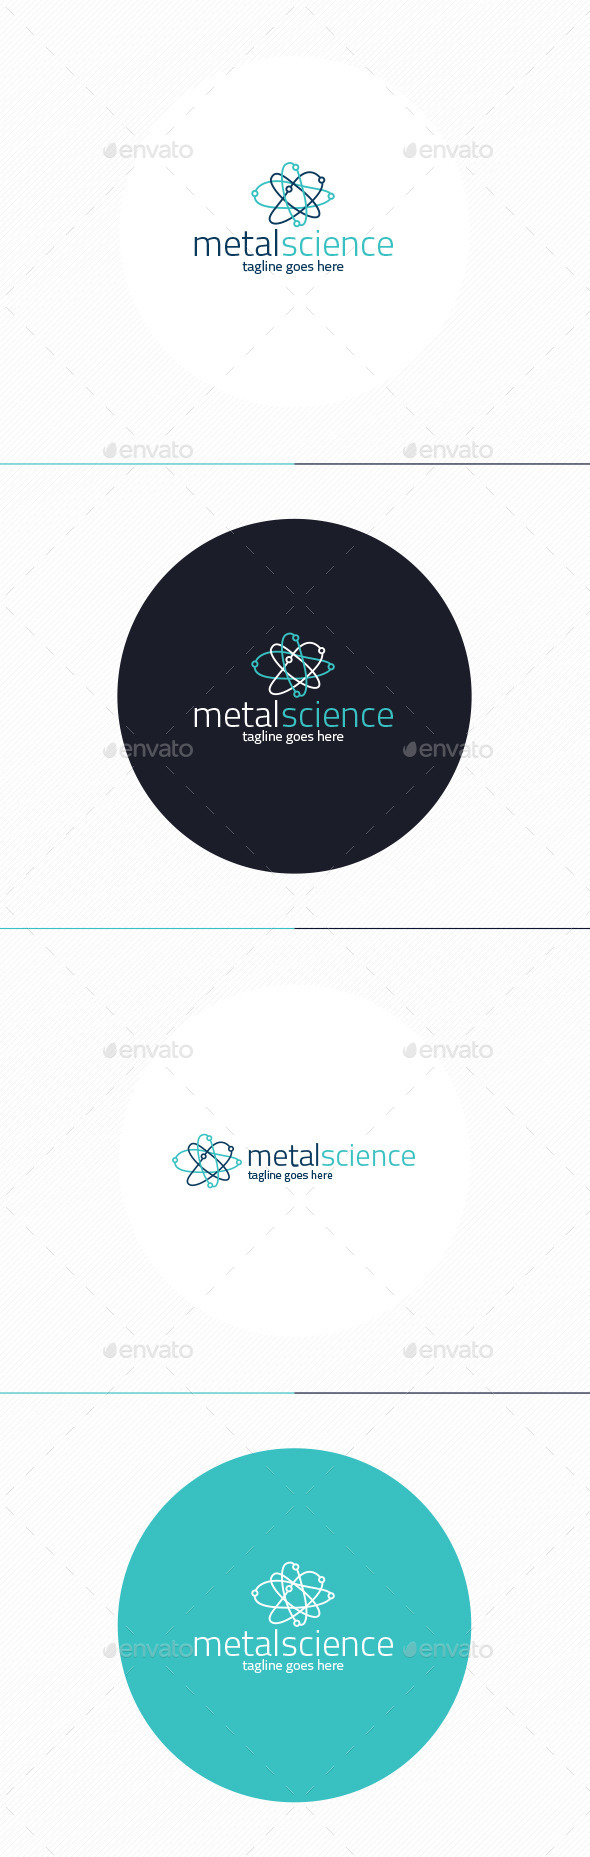 Metal Science Logo - Vector Abstract